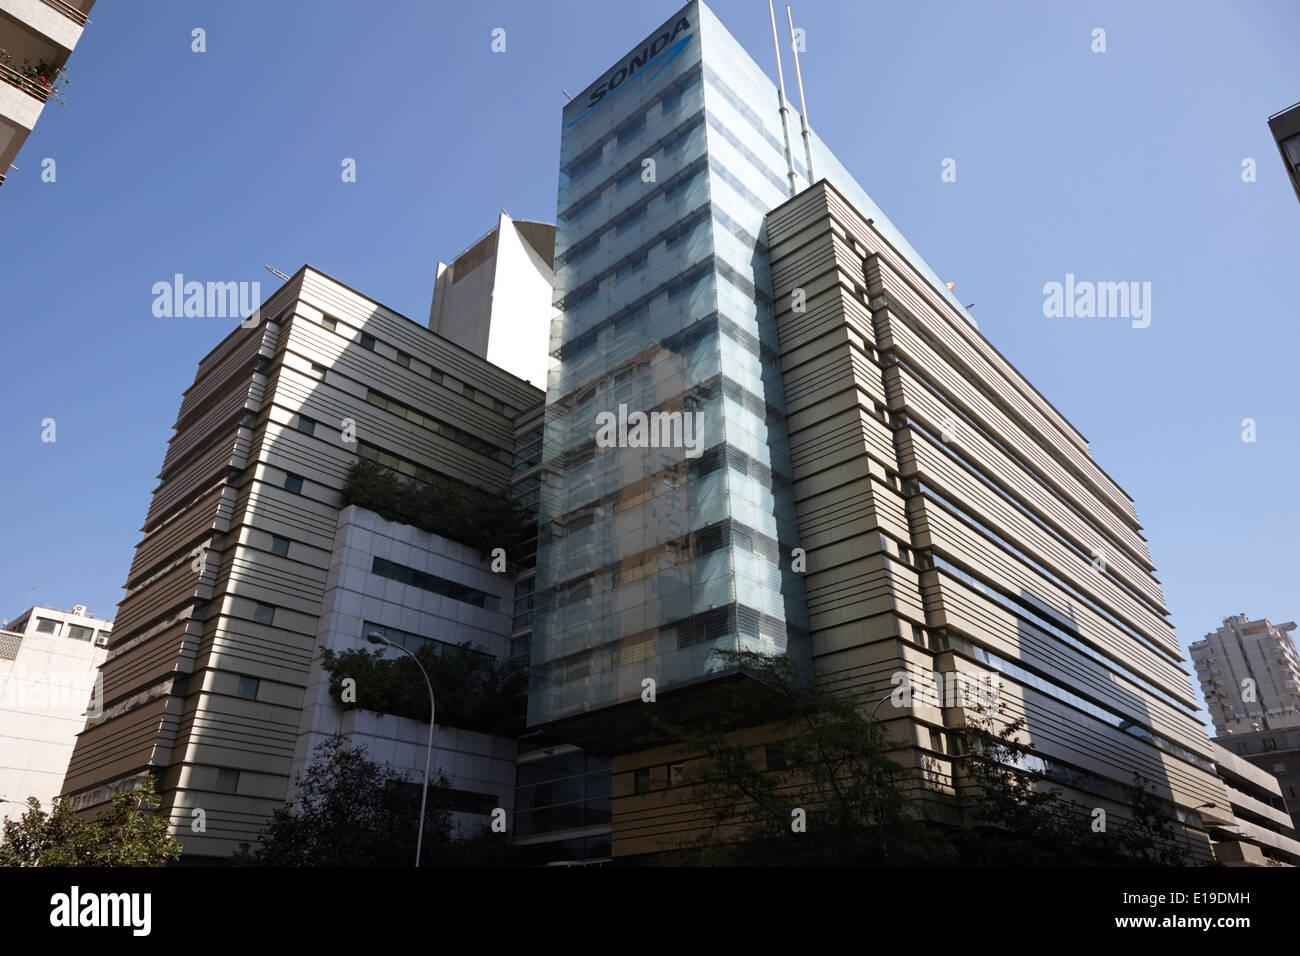 sonda it company headquarters Santiago Chile - Stock Image